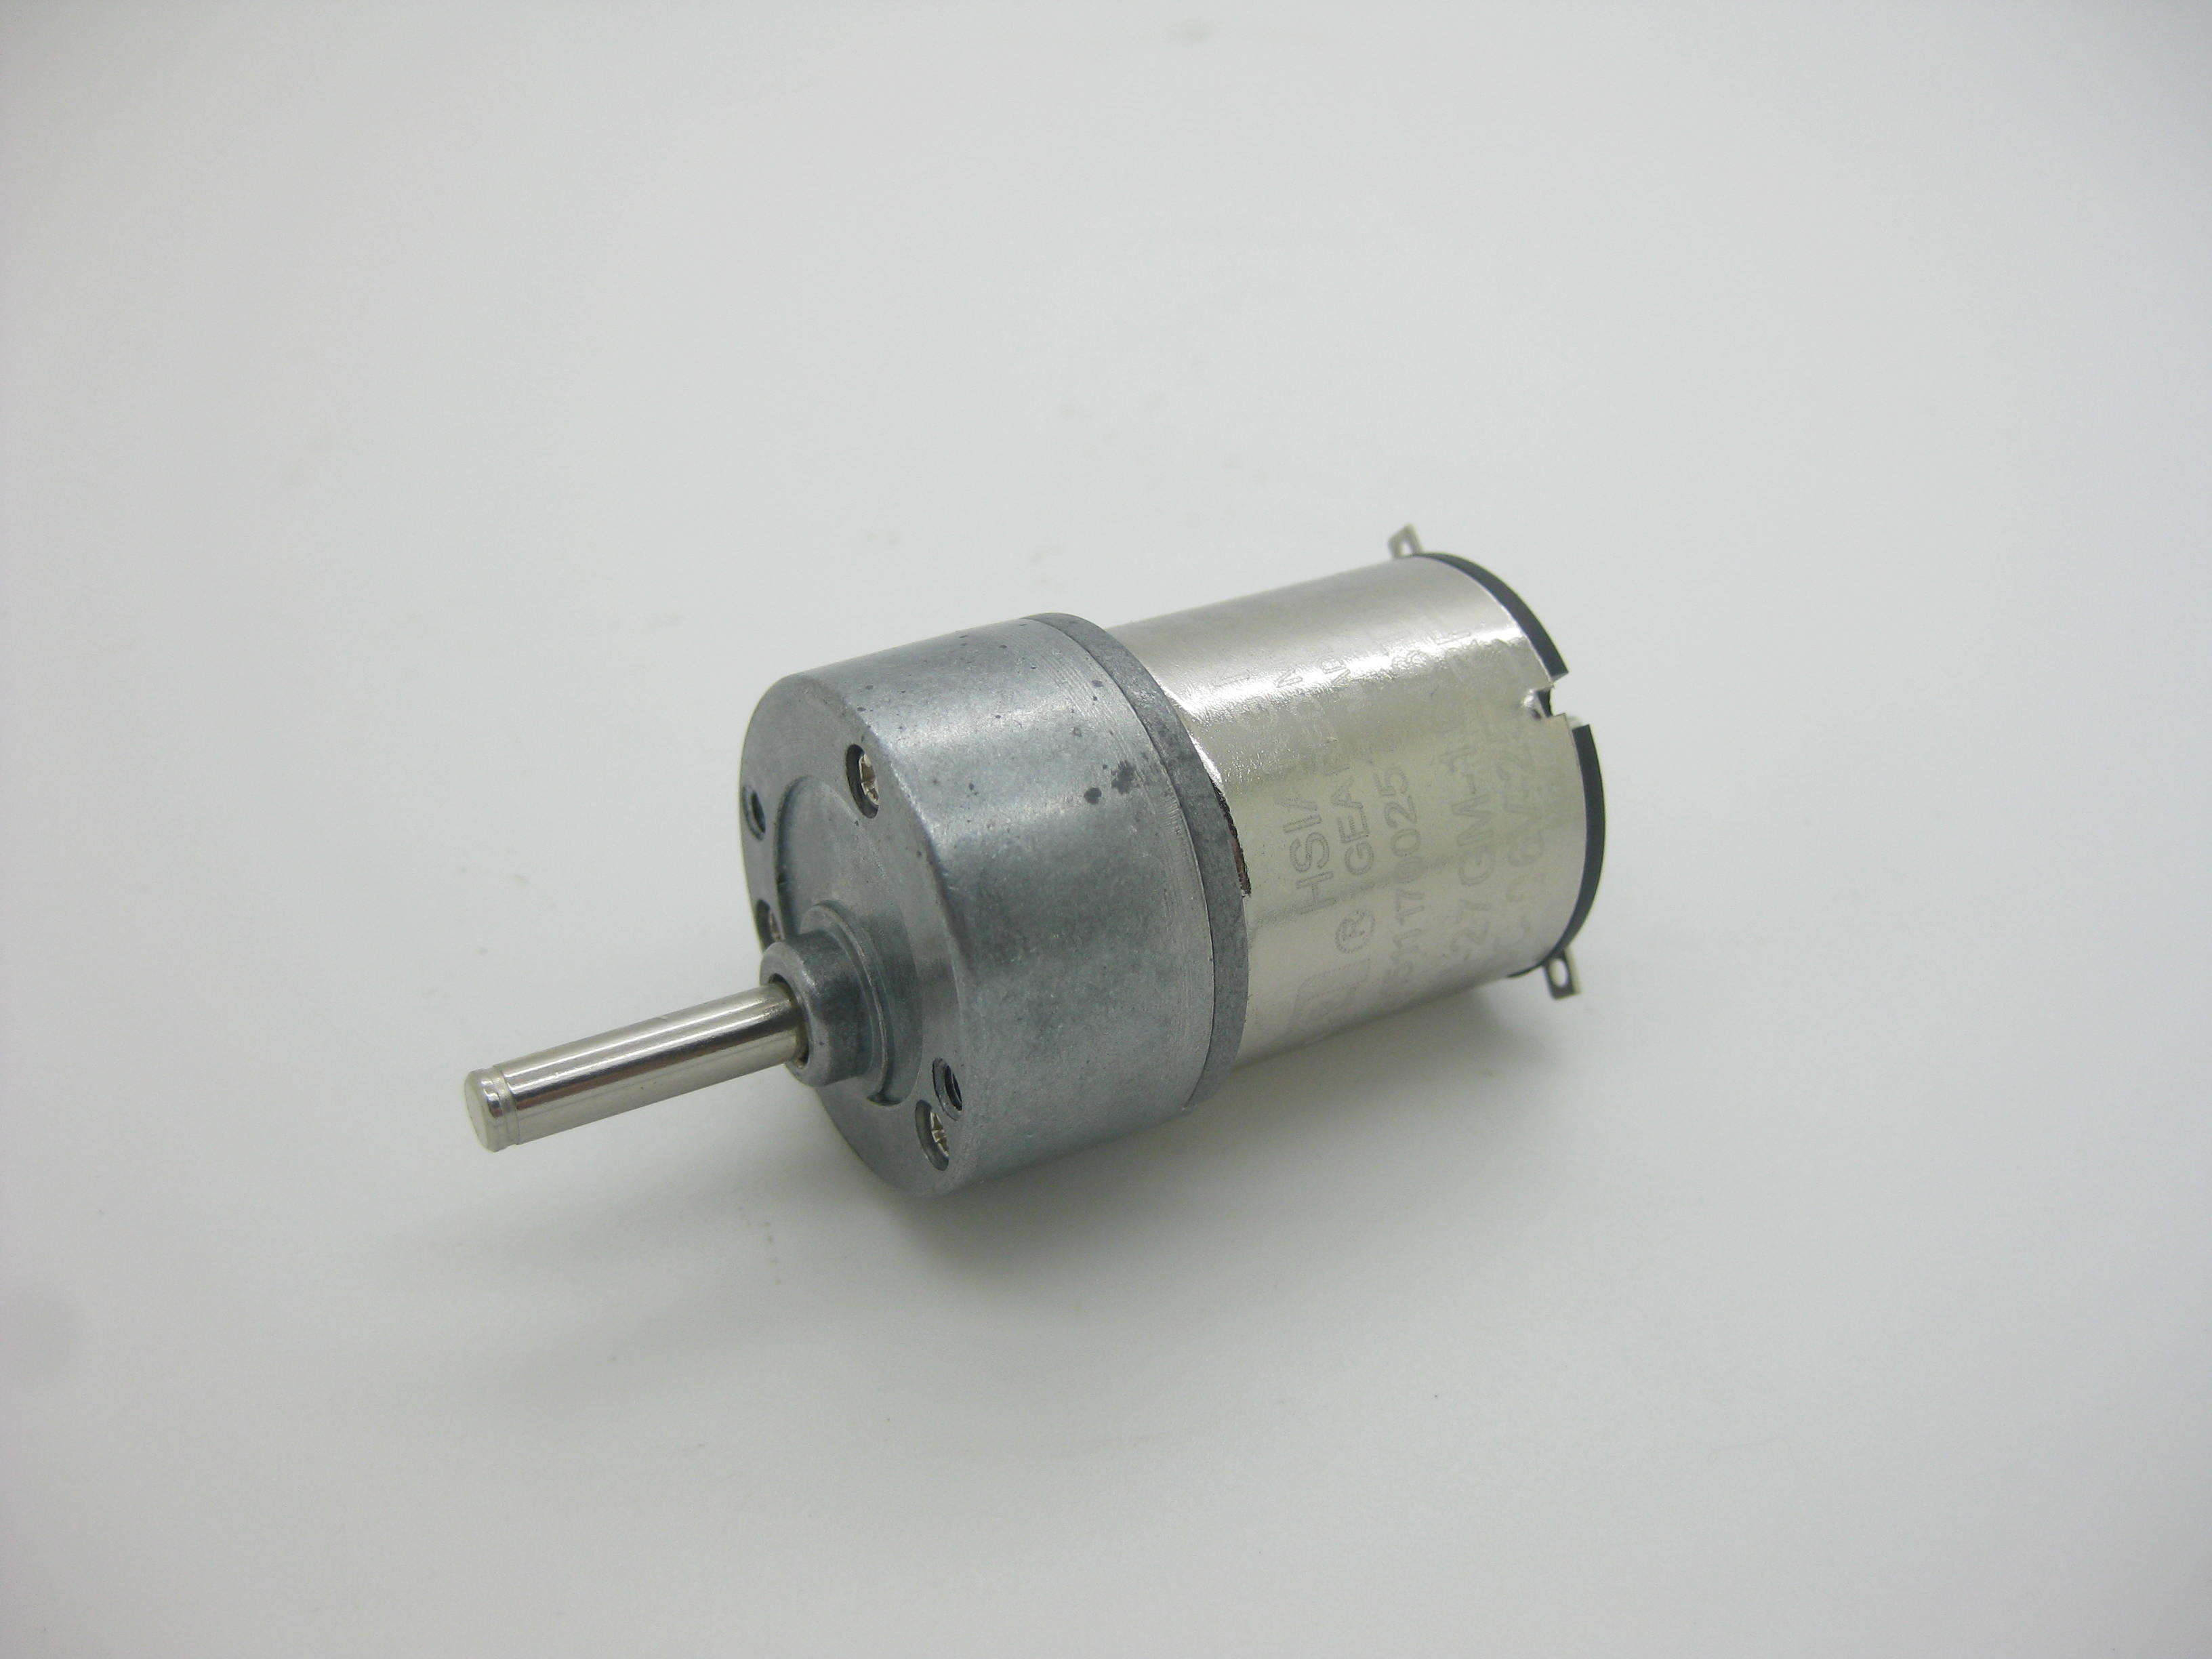 цена на Cleaner motor for IRobot Braava 380 380t 381 320 mint 5200c 5200 4200 4215 Wheel Motors Vacuum Cleaner Parts